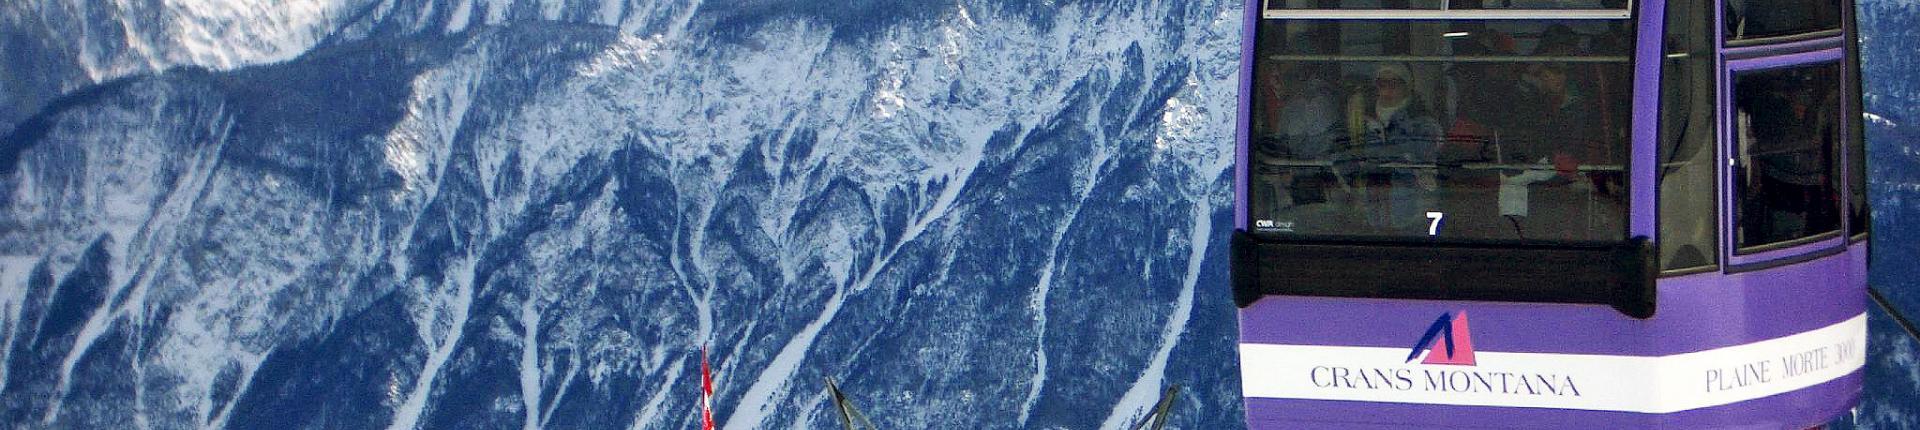 סקי בקראנס מונטנה